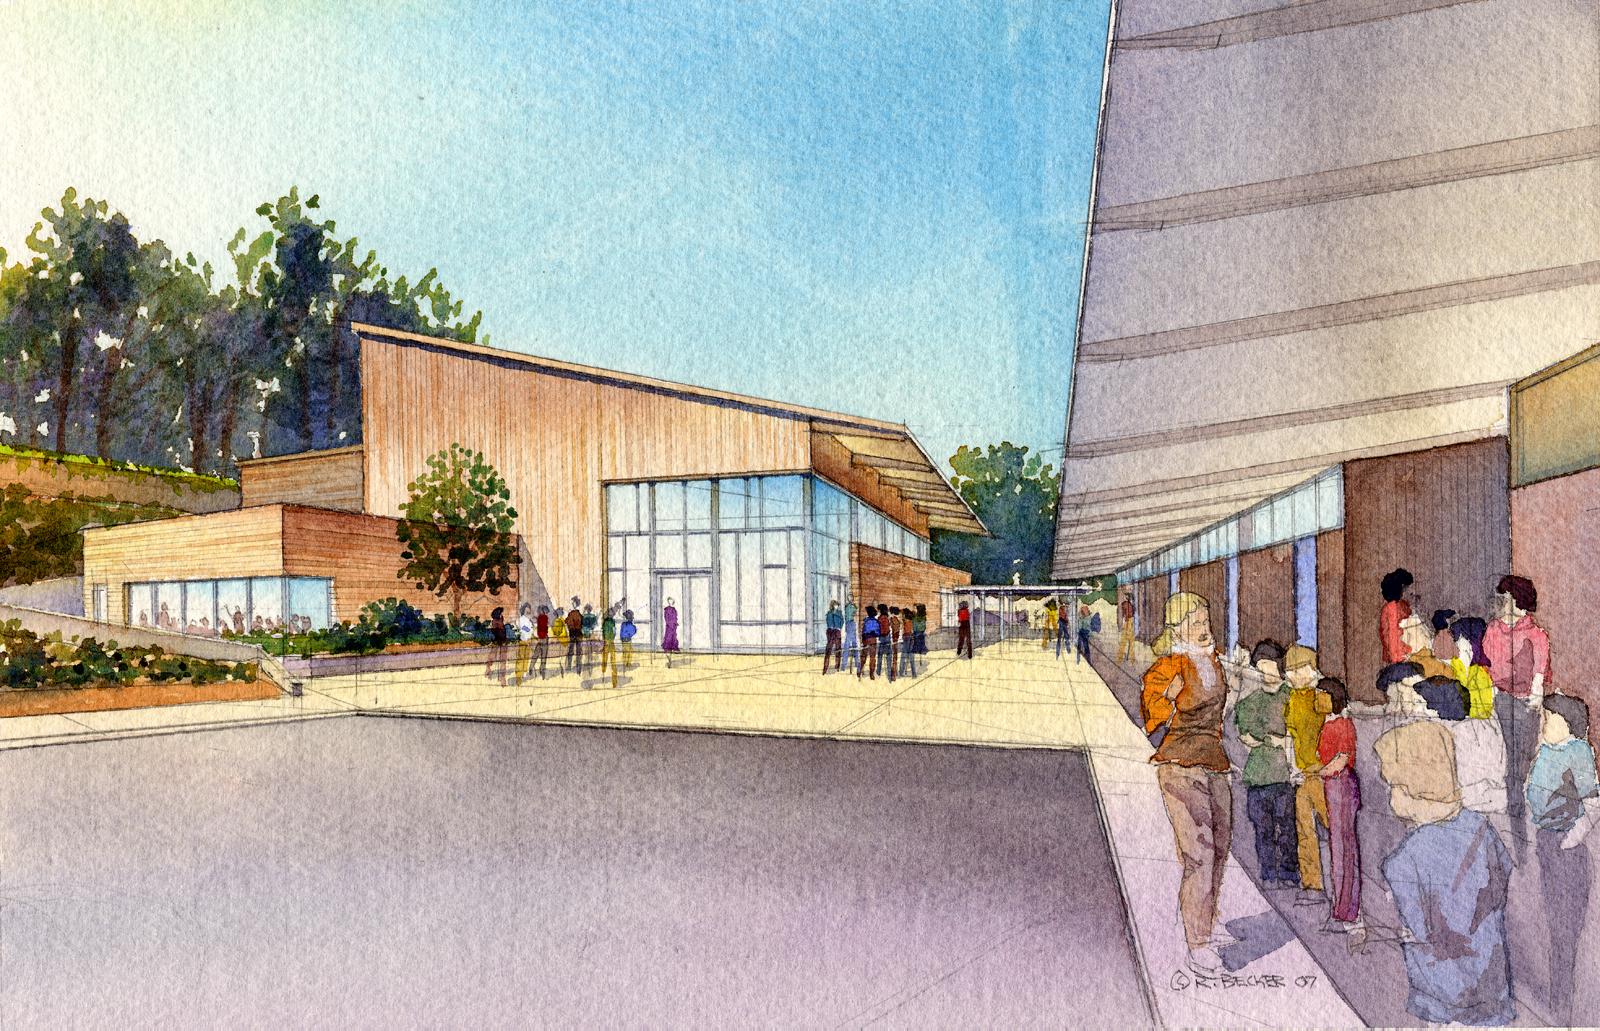 WRNS Hillsborough North School watercolor rendering